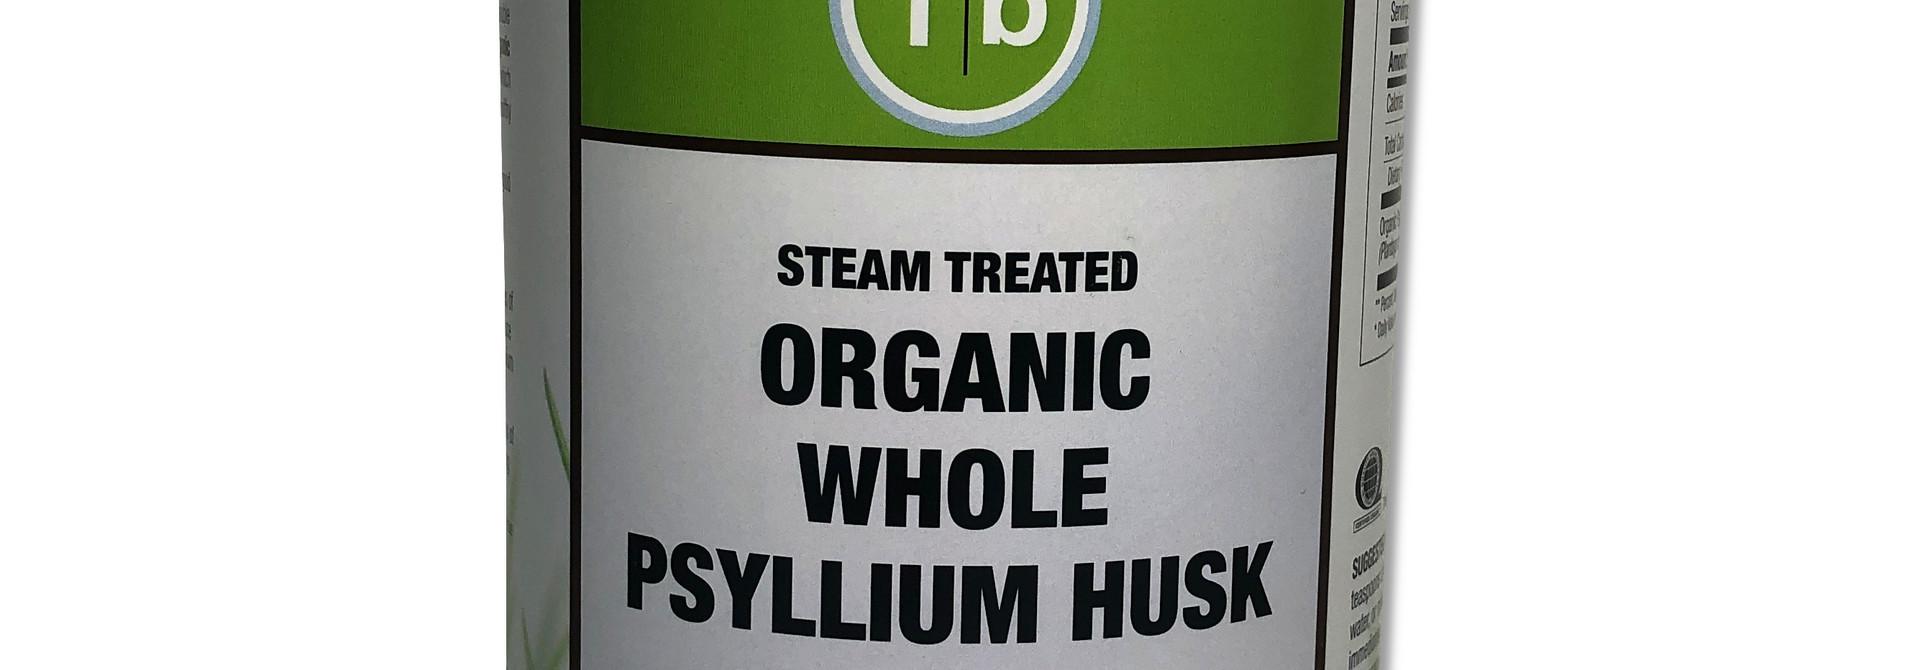 Organic Psyllium Husk